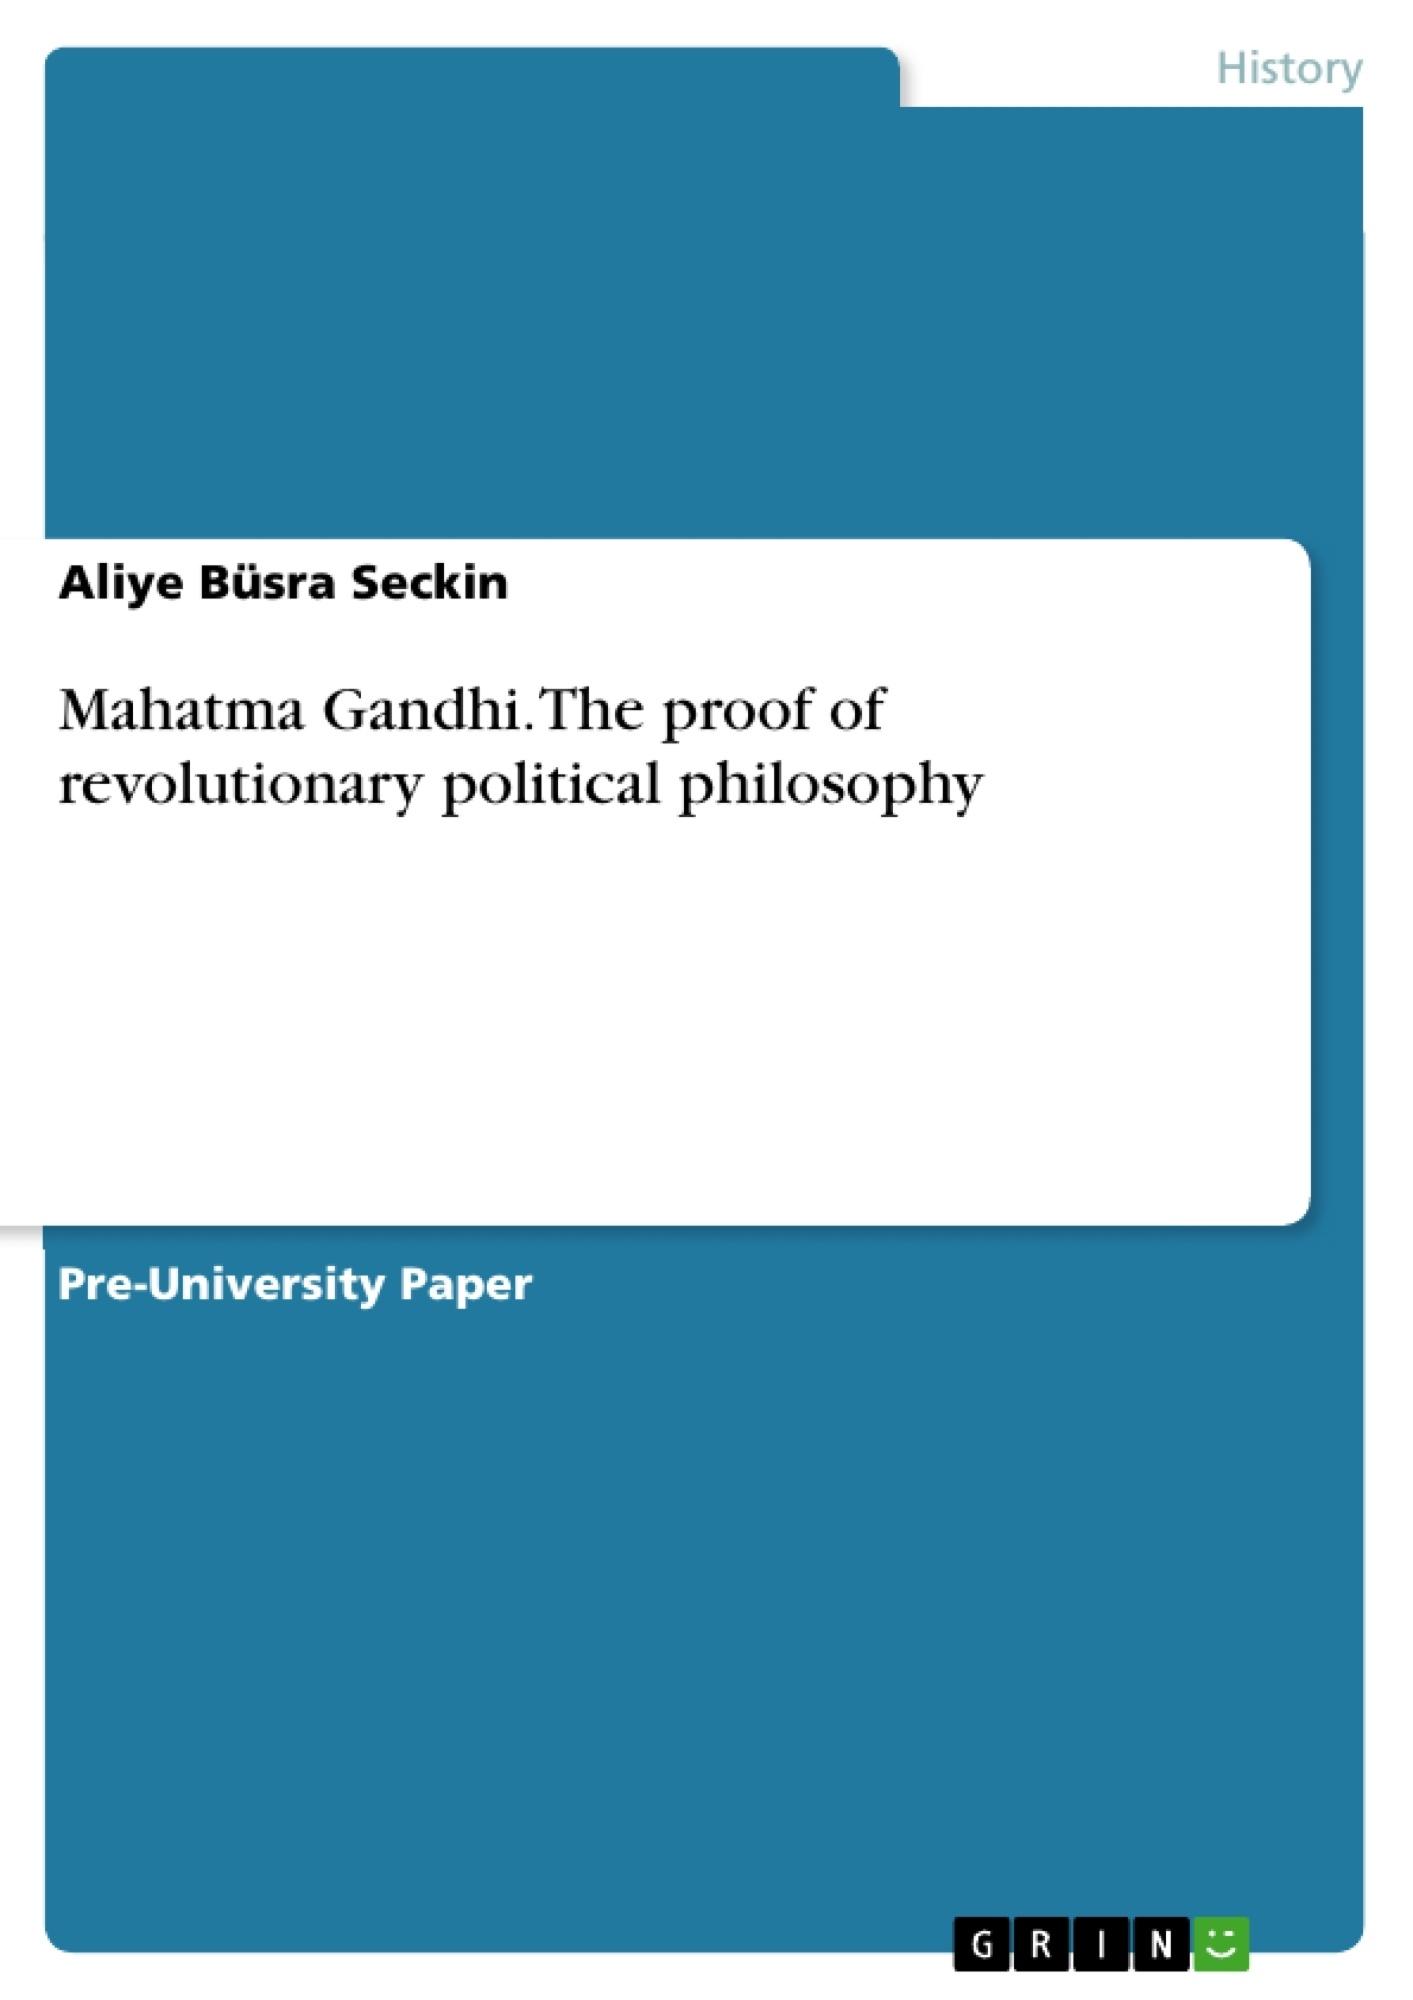 Title: Mahatma Gandhi. The proof of revolutionary political philosophy